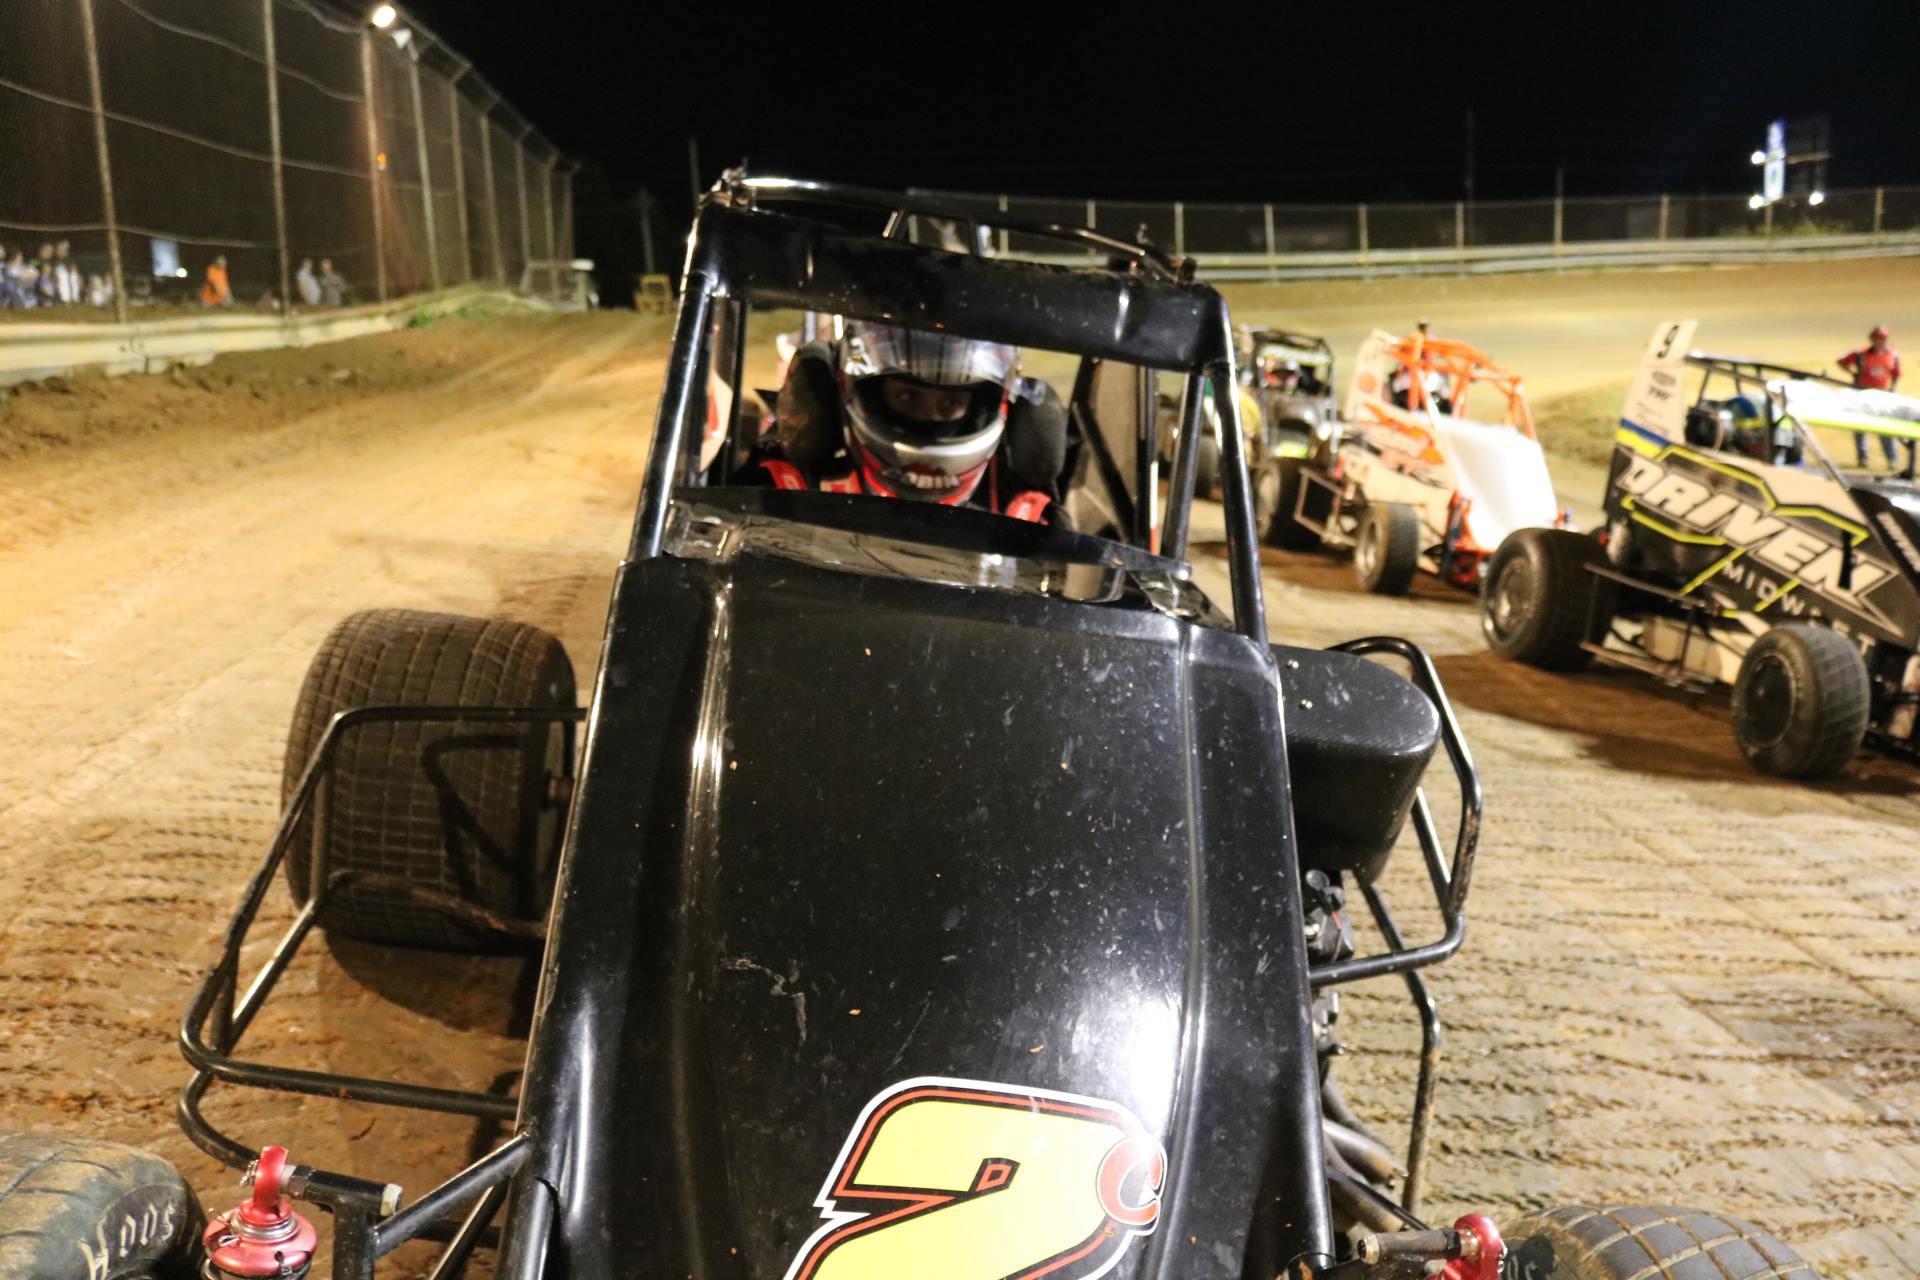 Terry Sprague Memorial Race